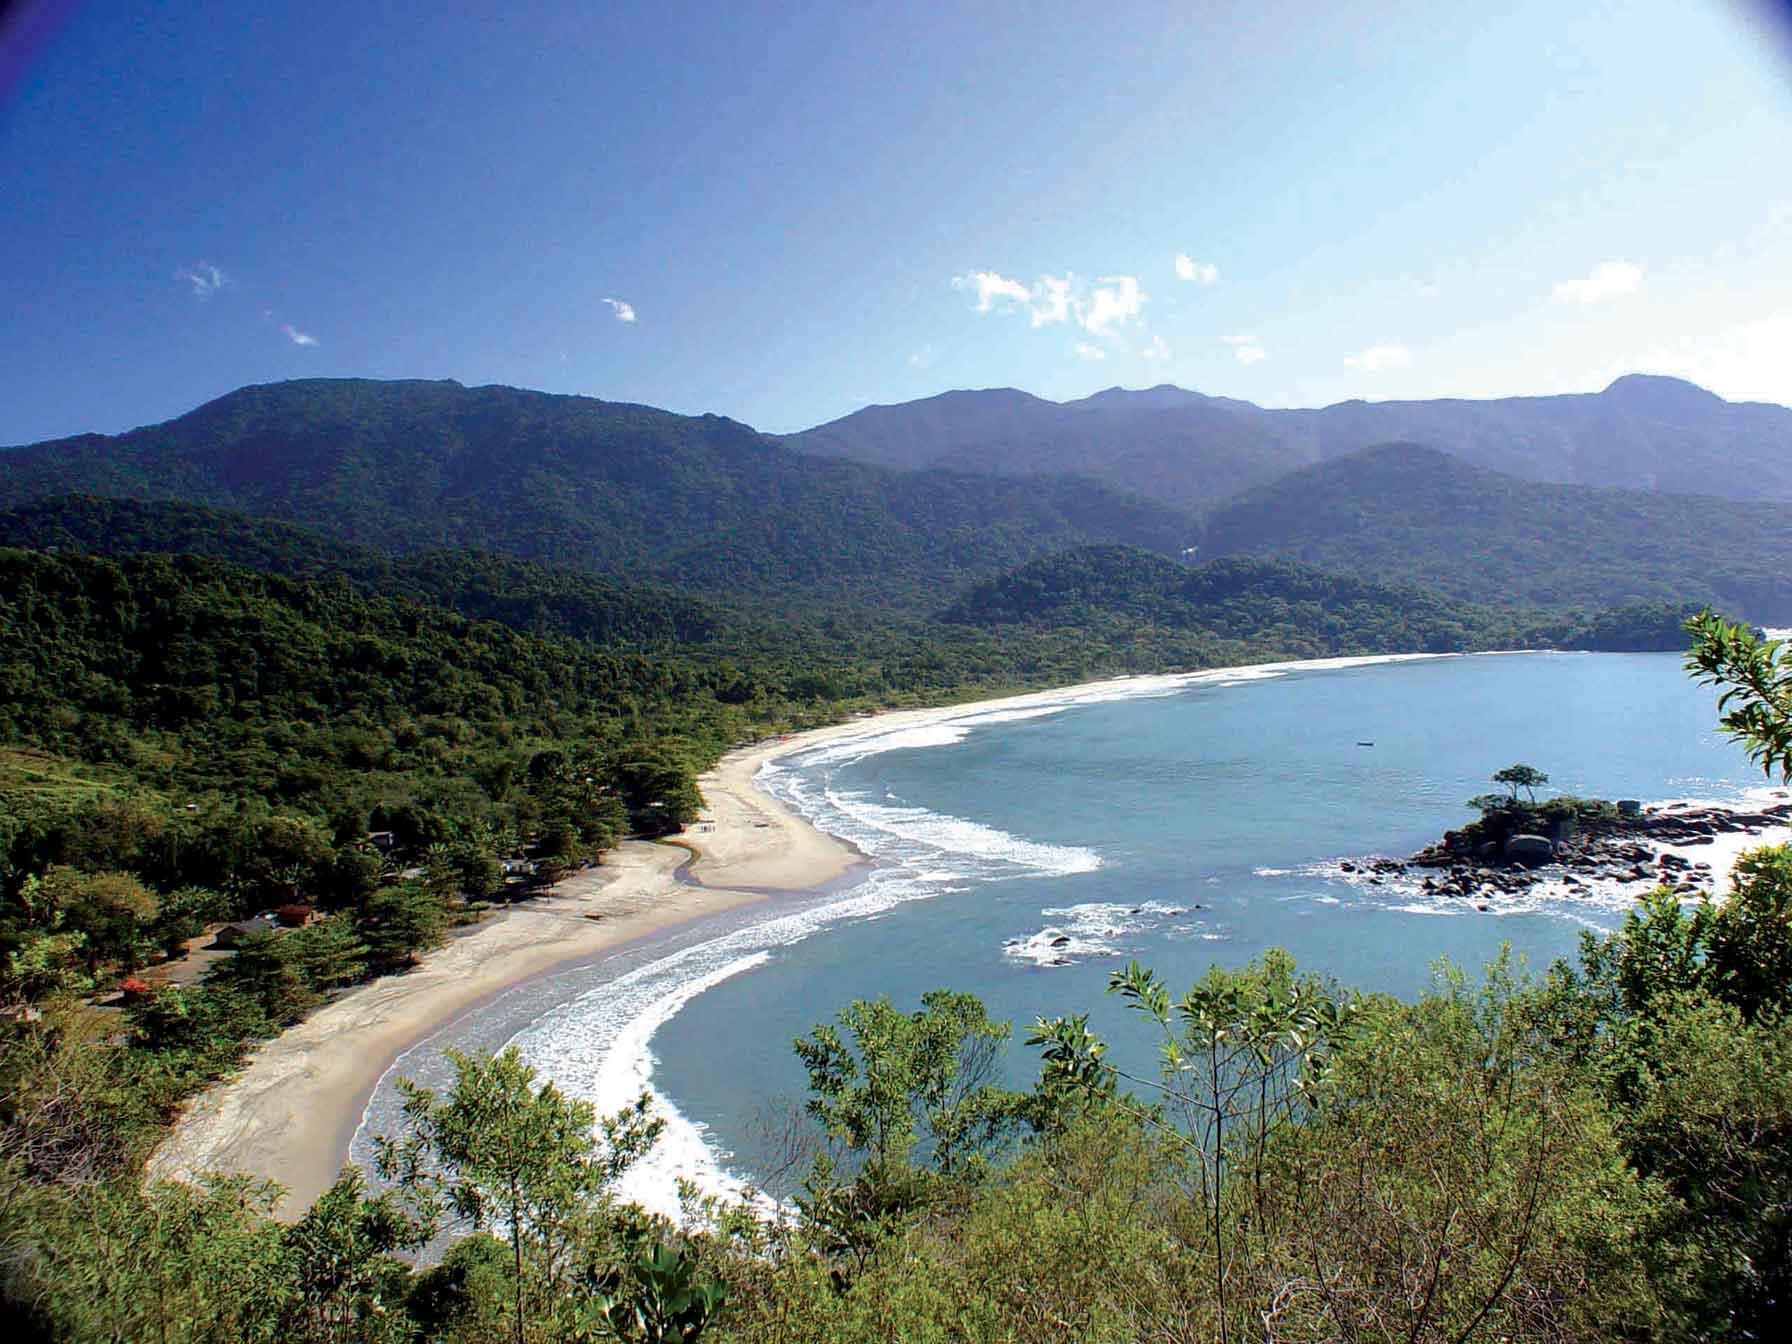 Praias do Leste - Ilhabela-ilhabela-meio-ambiente-praia-de-castelhanos-leste-robert-werner-bx